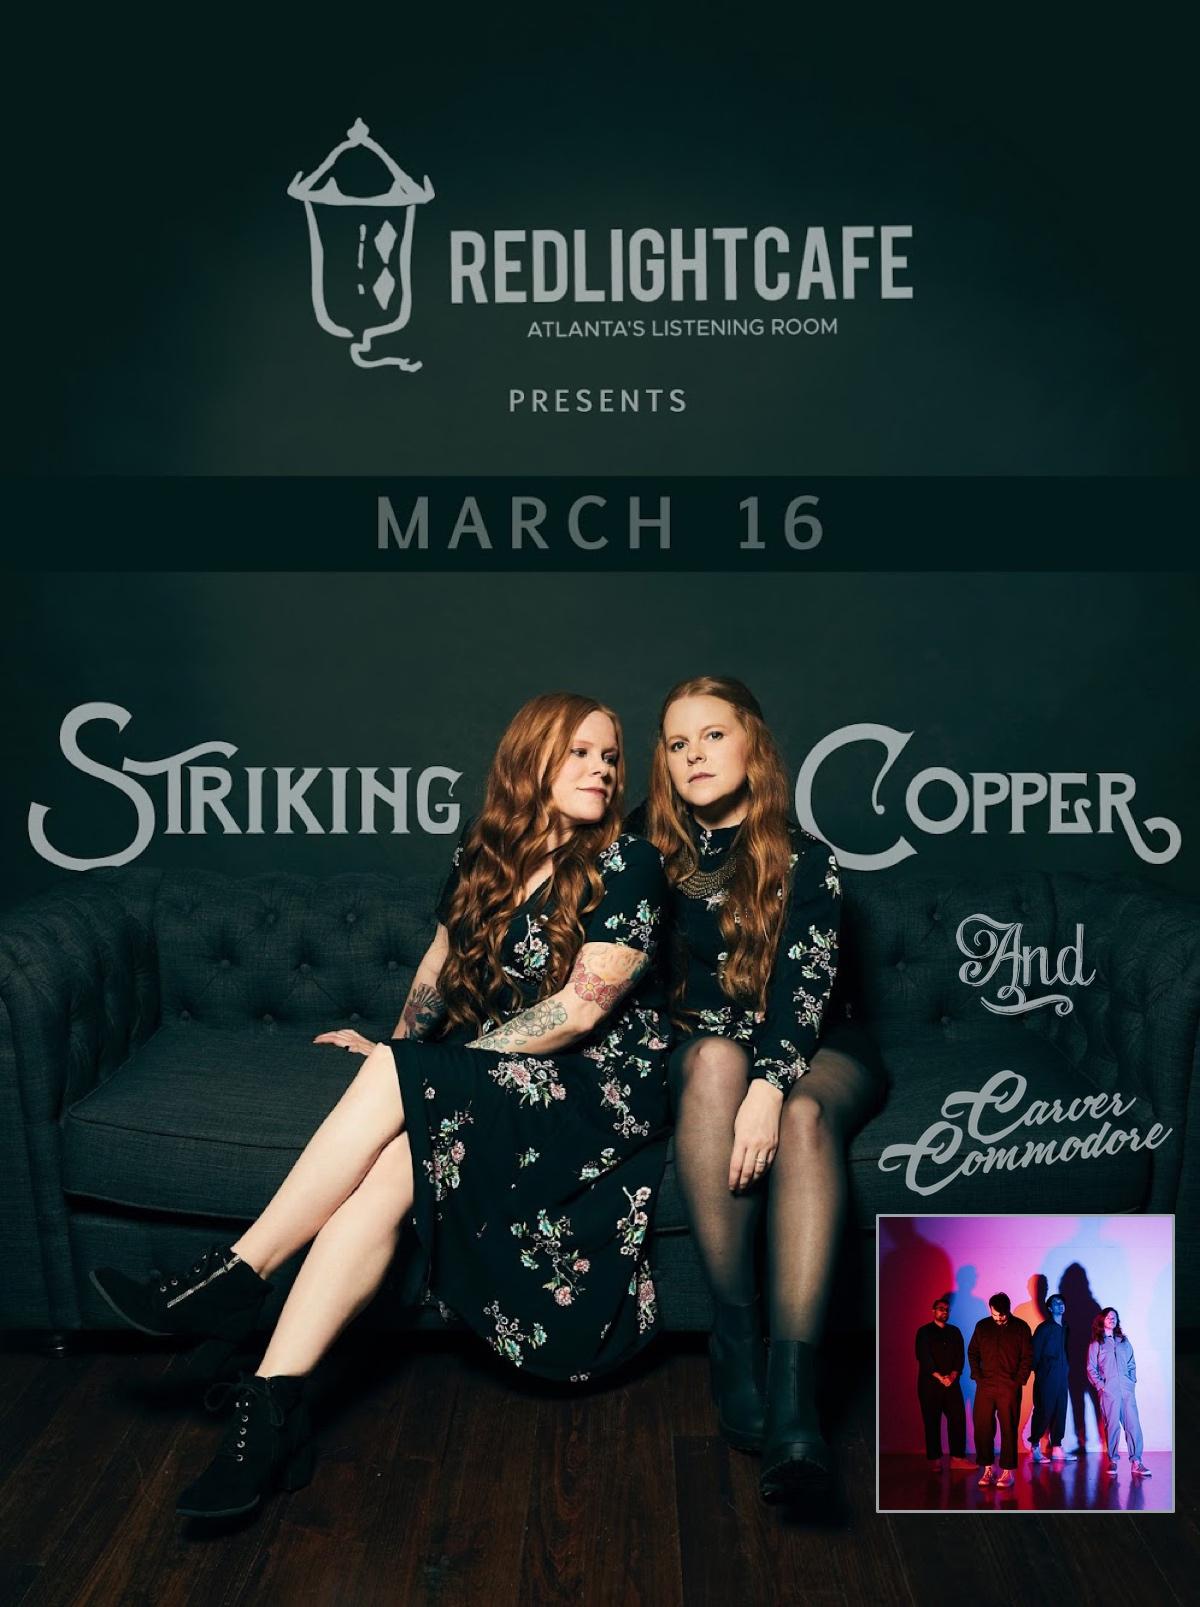 Striking Copper + Carver Commodore w/ special guests — March 16, 2019 — Red Light Café, Atlanta, GA